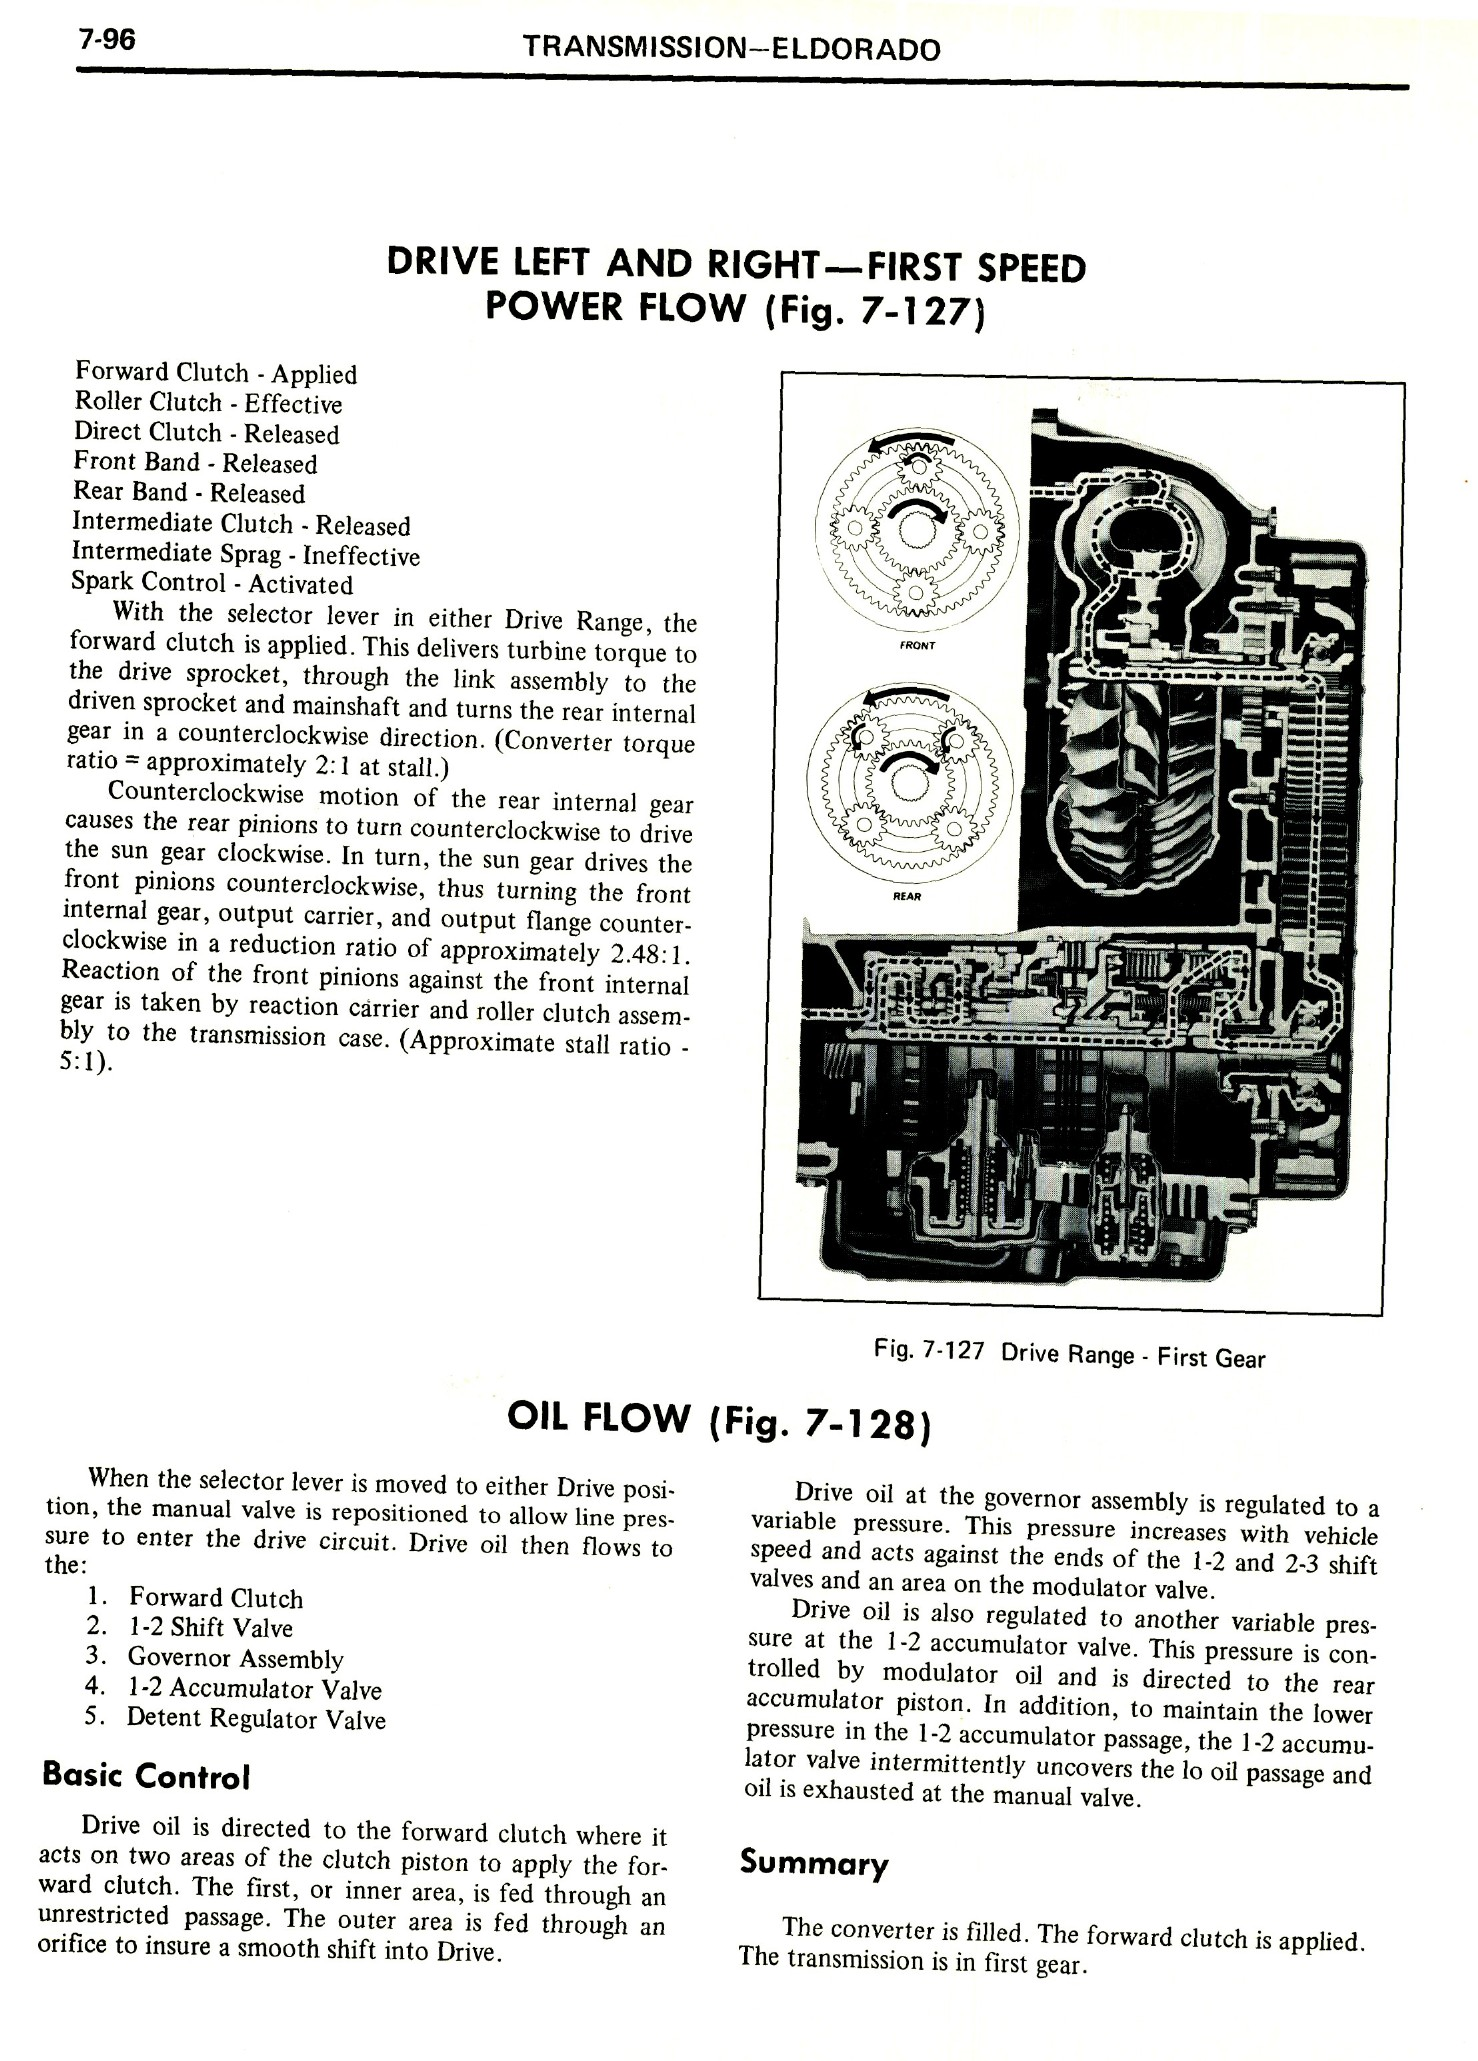 1971 Cadillac Shop Manual- Transmission Page 96 of 156